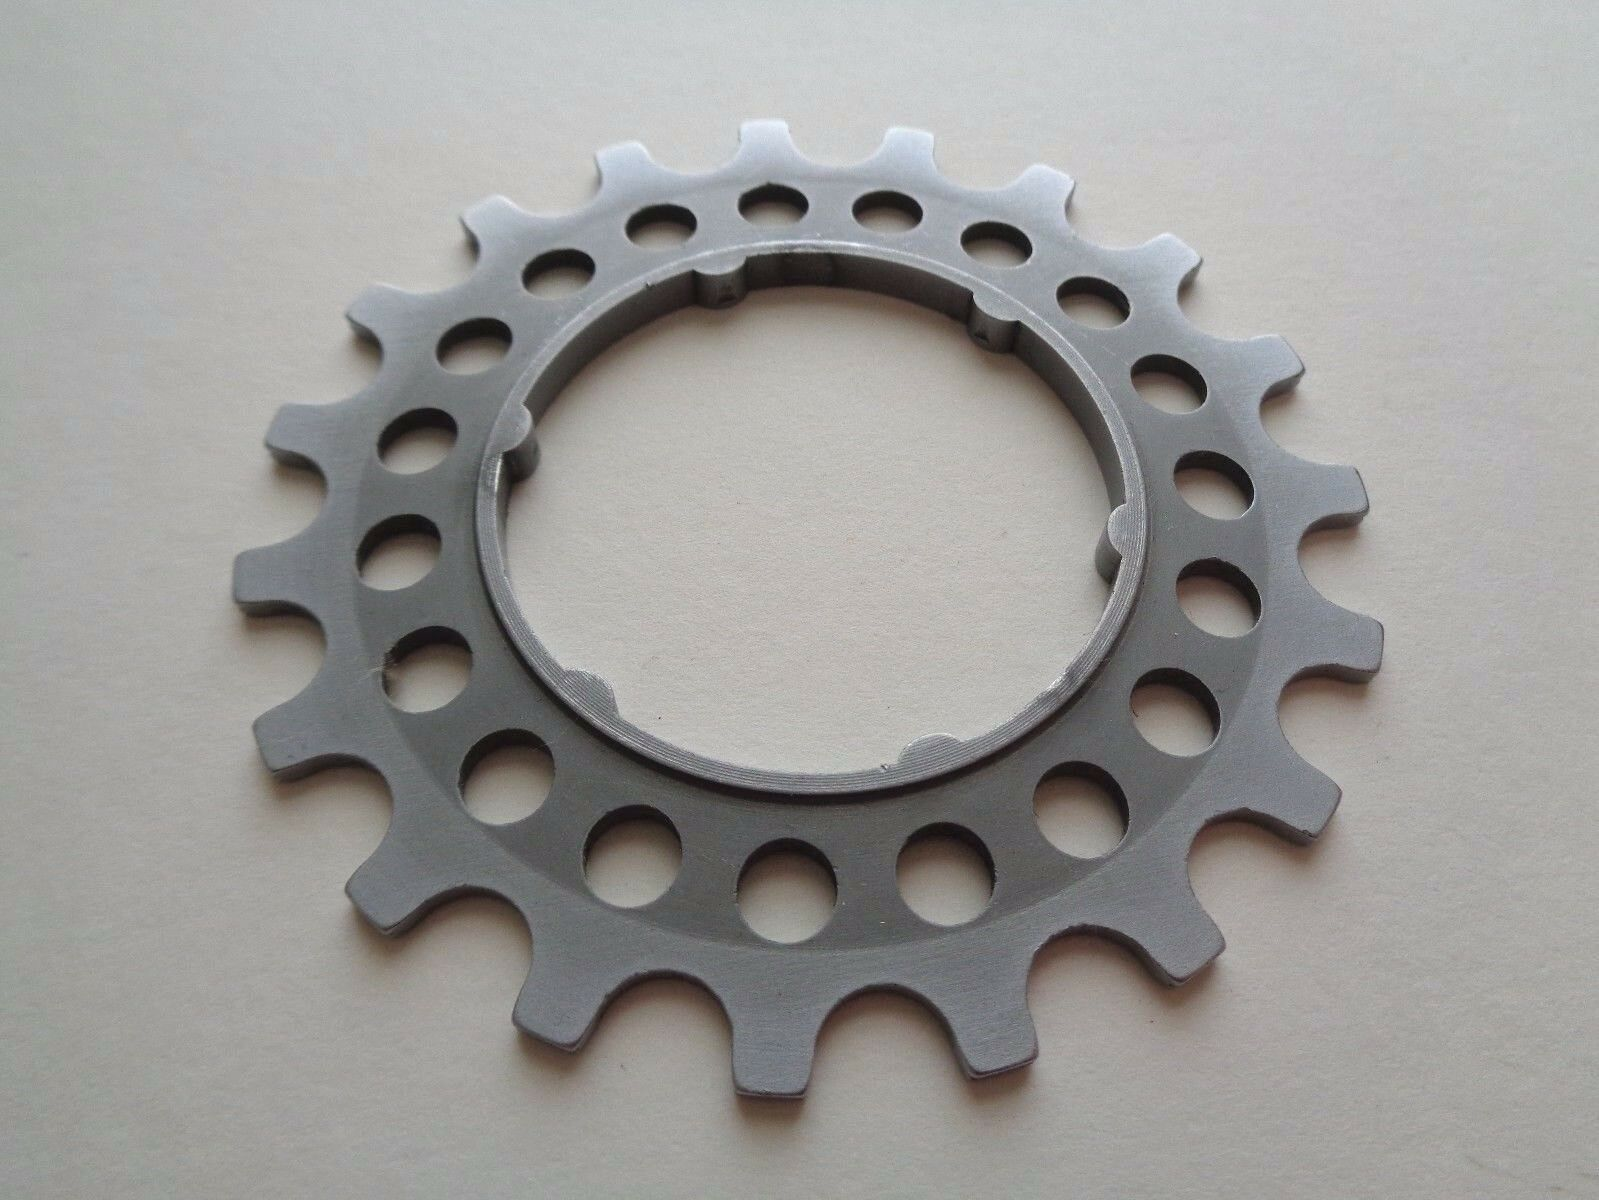 NOS Vintage 1980s Campagnolo DE19 Aluminium 19t Italian freewheel cassette Cog